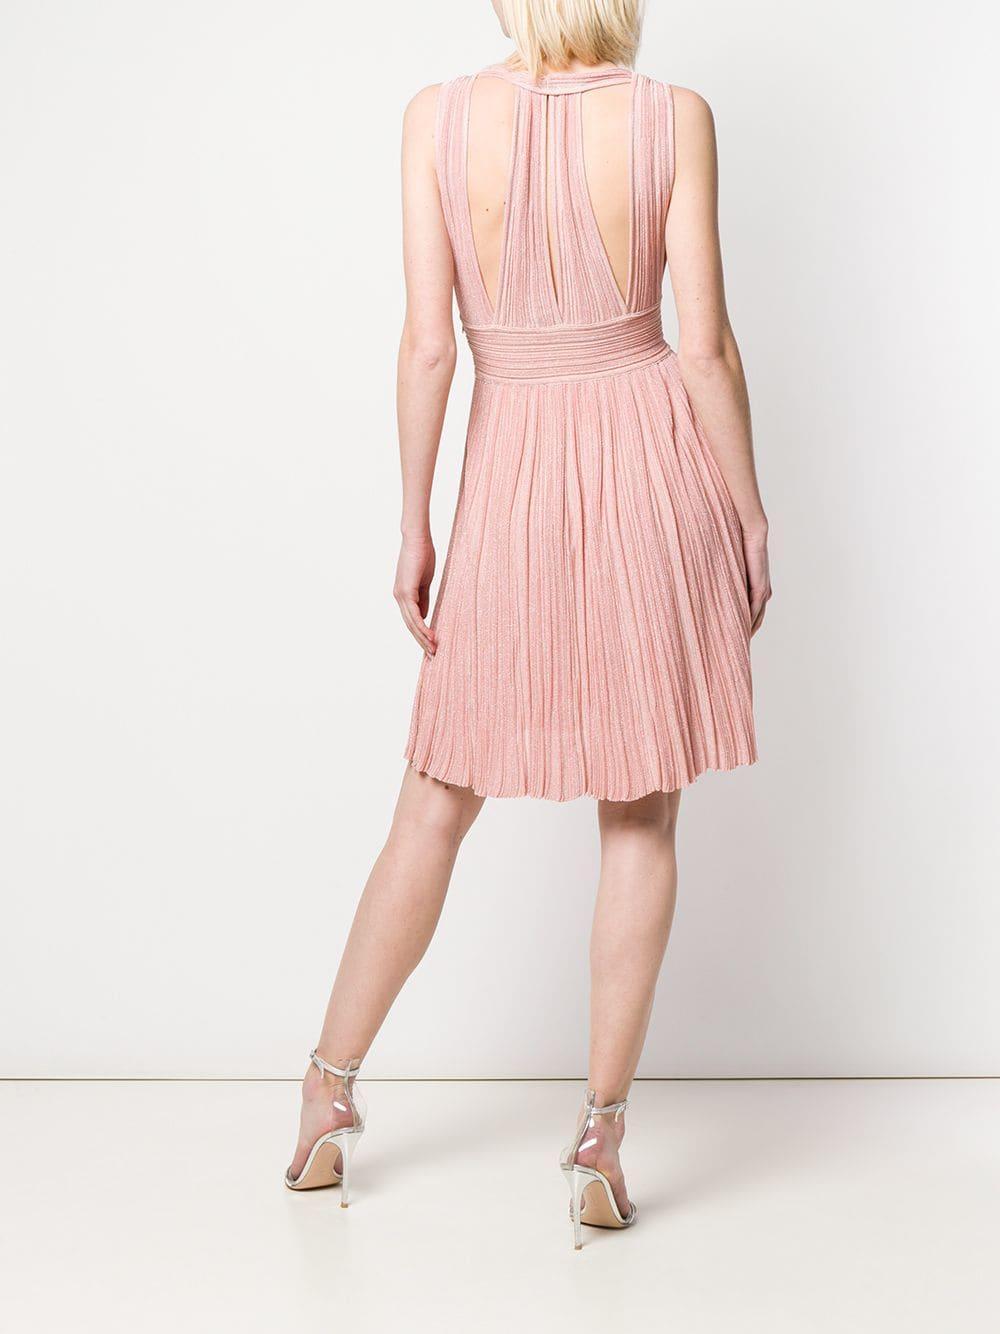 Antonino Valenti - Pink Plunging Neck Dress - Lyst. View fullscreen adb52366c